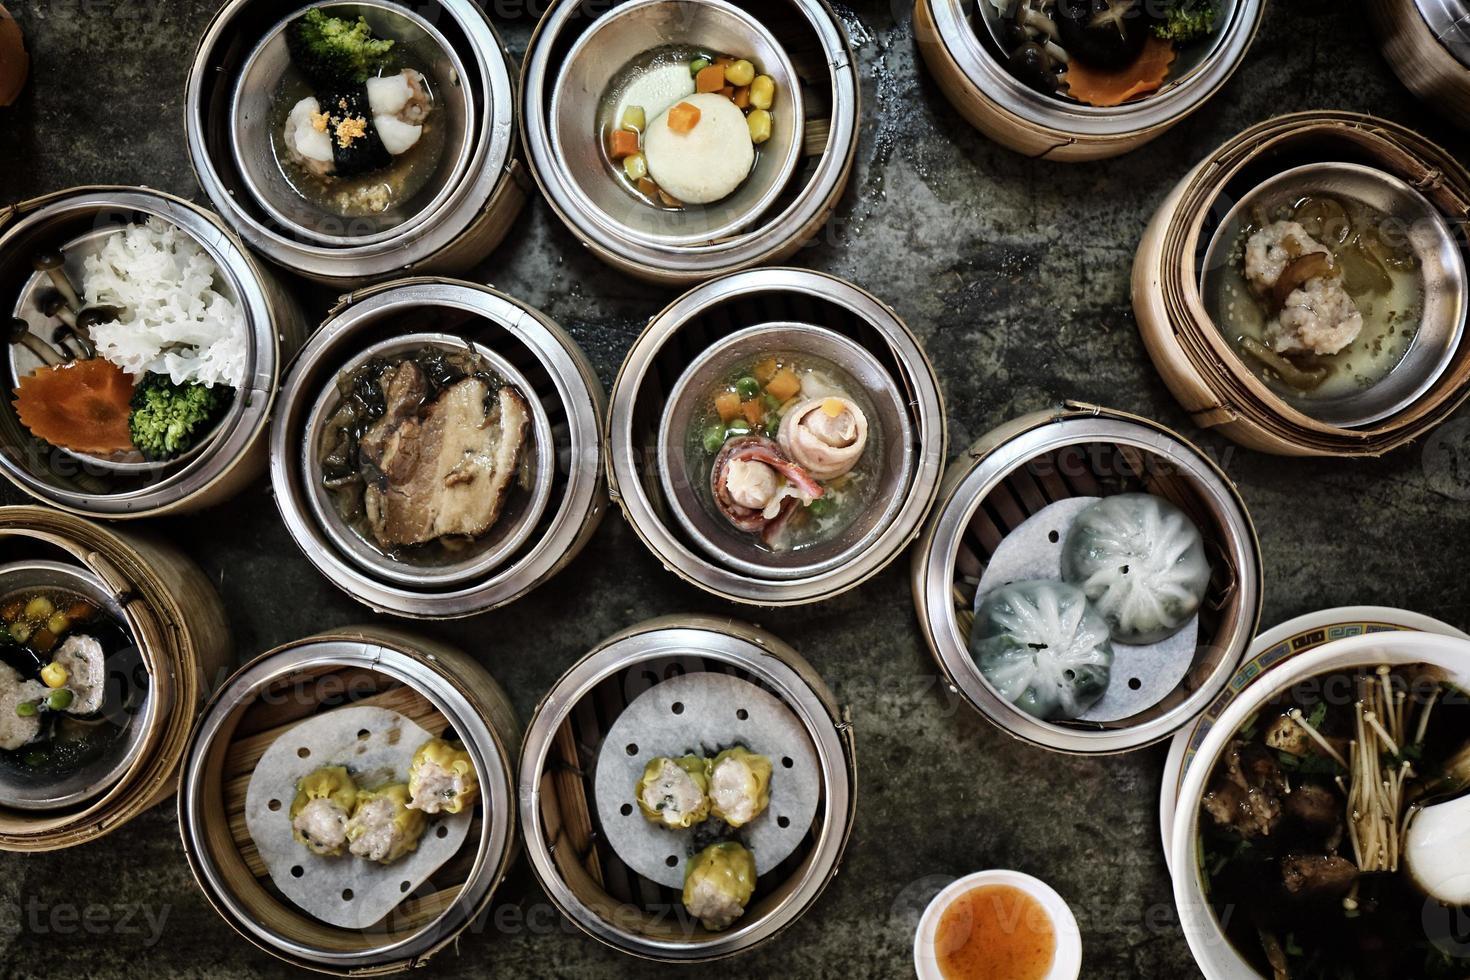 comida chinesa dimsum foto